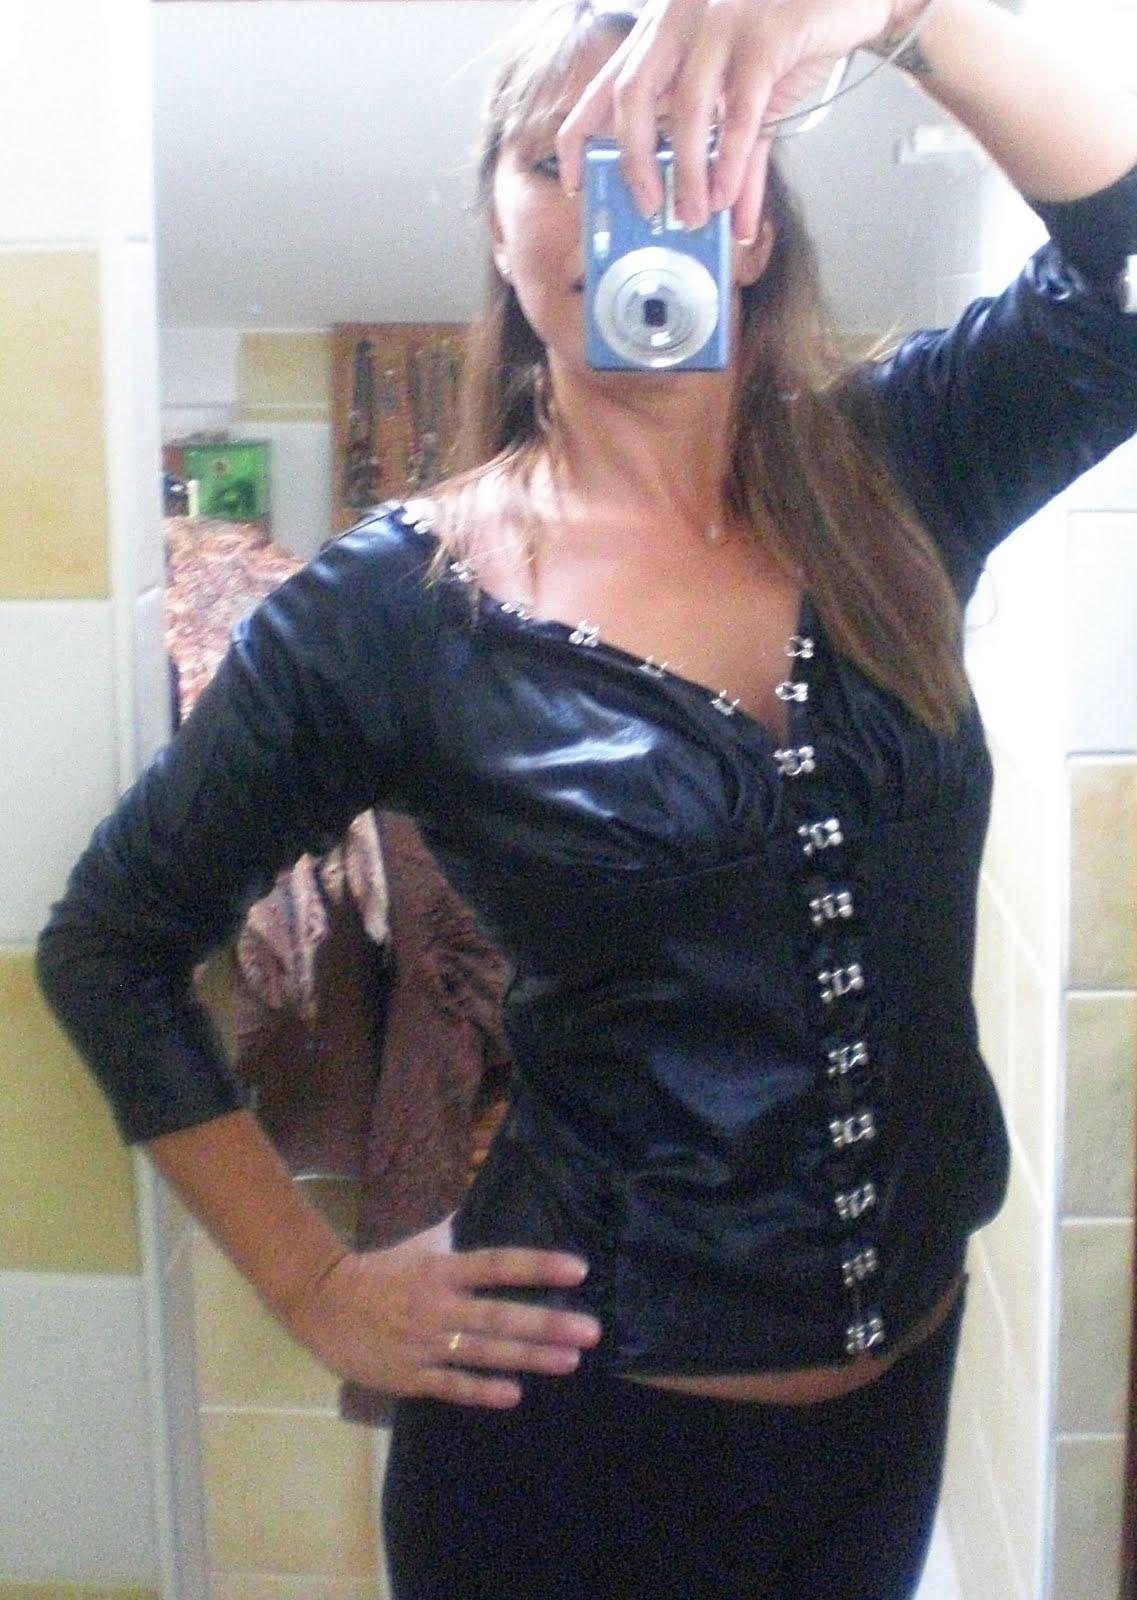 miss coco vide son dressing montpellier h rault 34 super sexy chemisier noir t 3. Black Bedroom Furniture Sets. Home Design Ideas